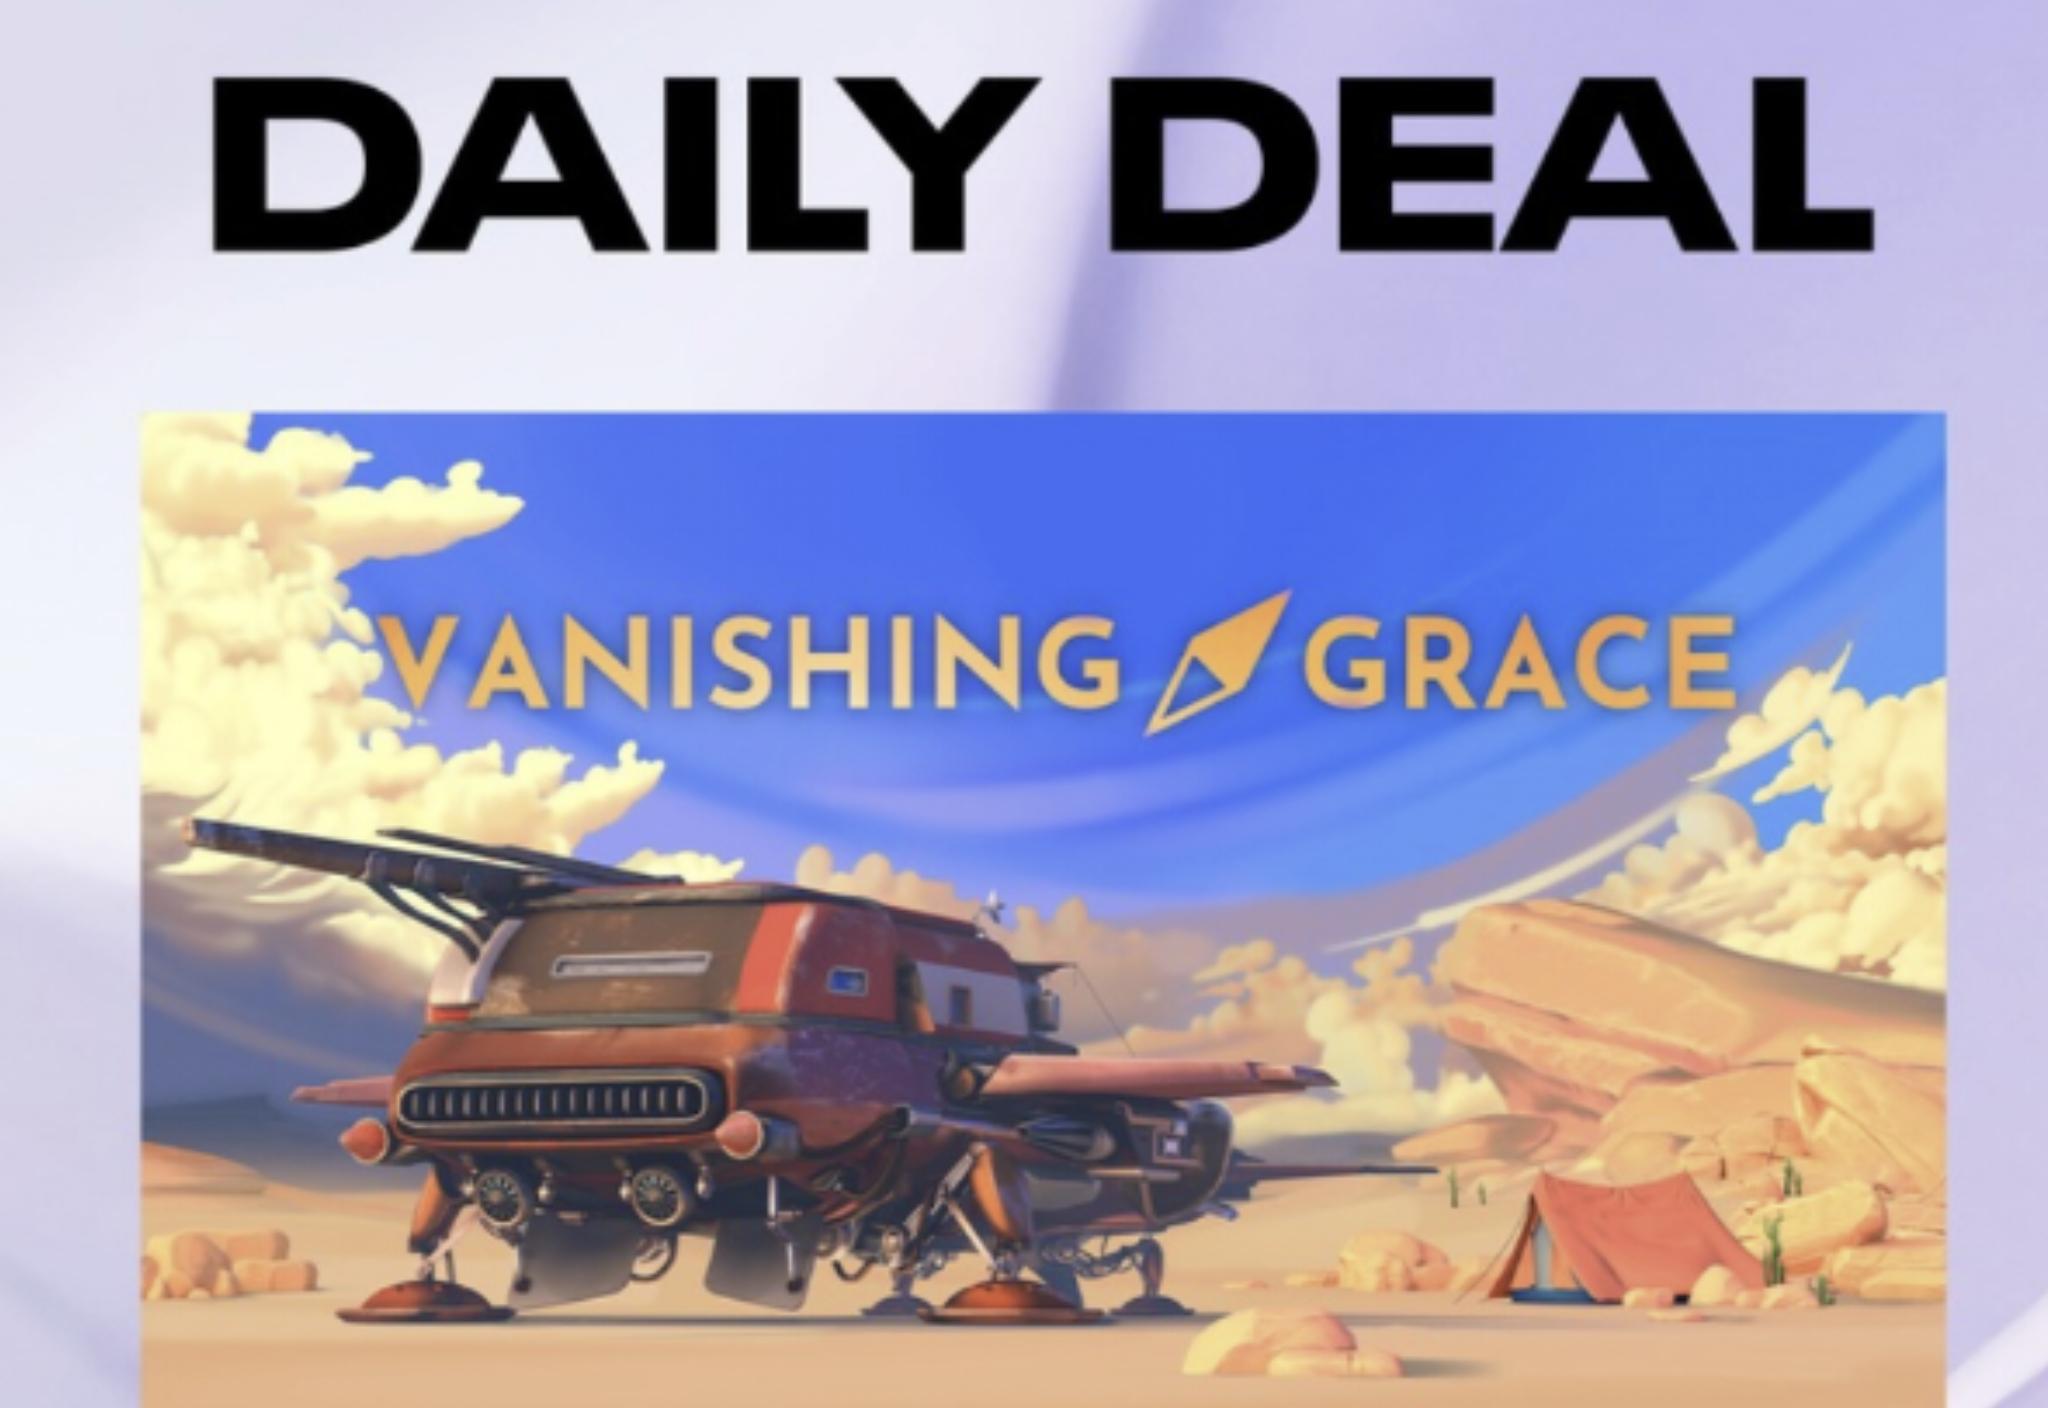 Oculus VR Daily Deal - Vanishing Grace £11.99 @ Oculus